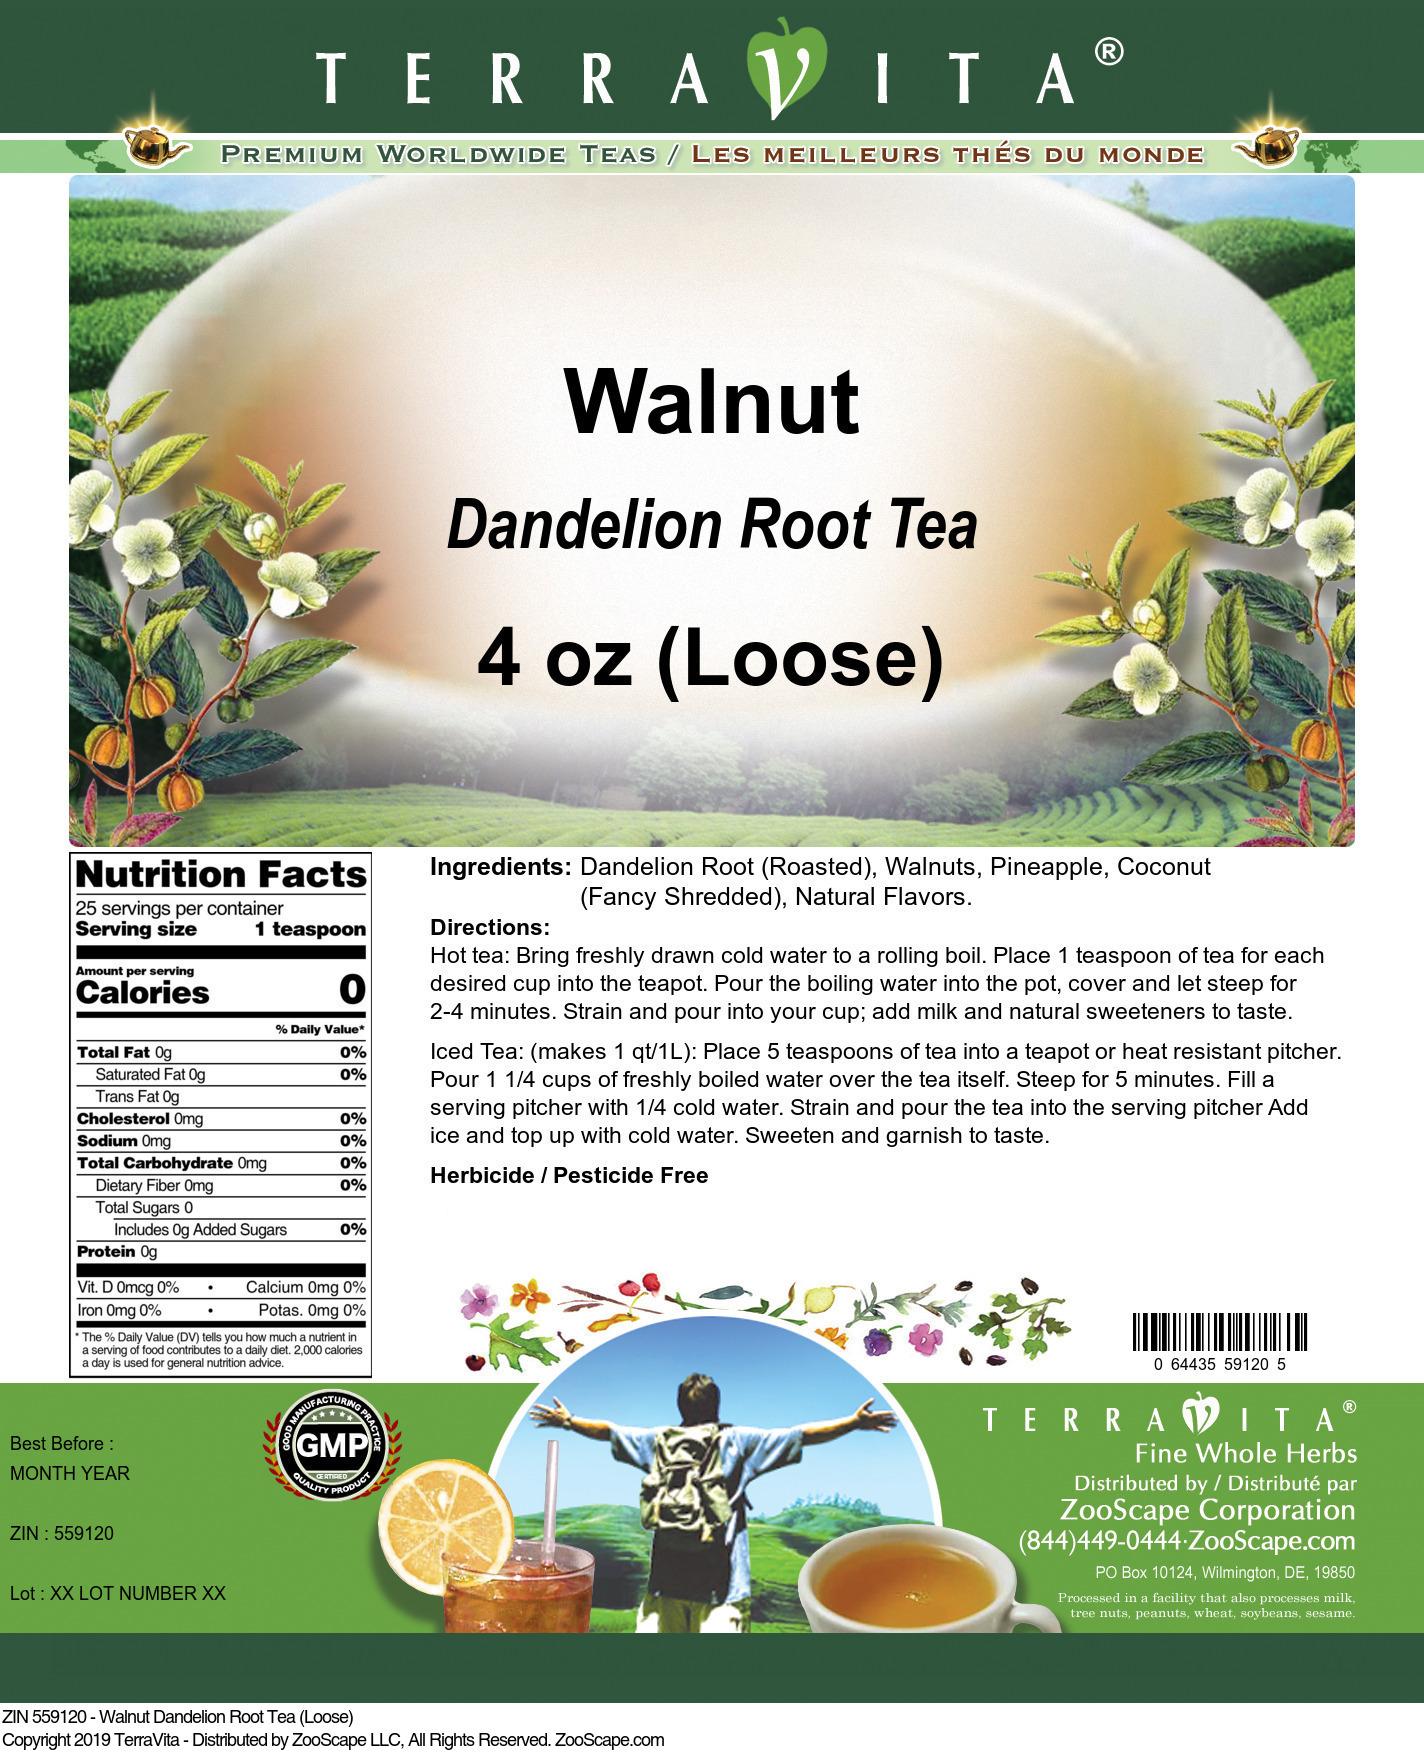 Walnut Dandelion Root Tea (Loose)